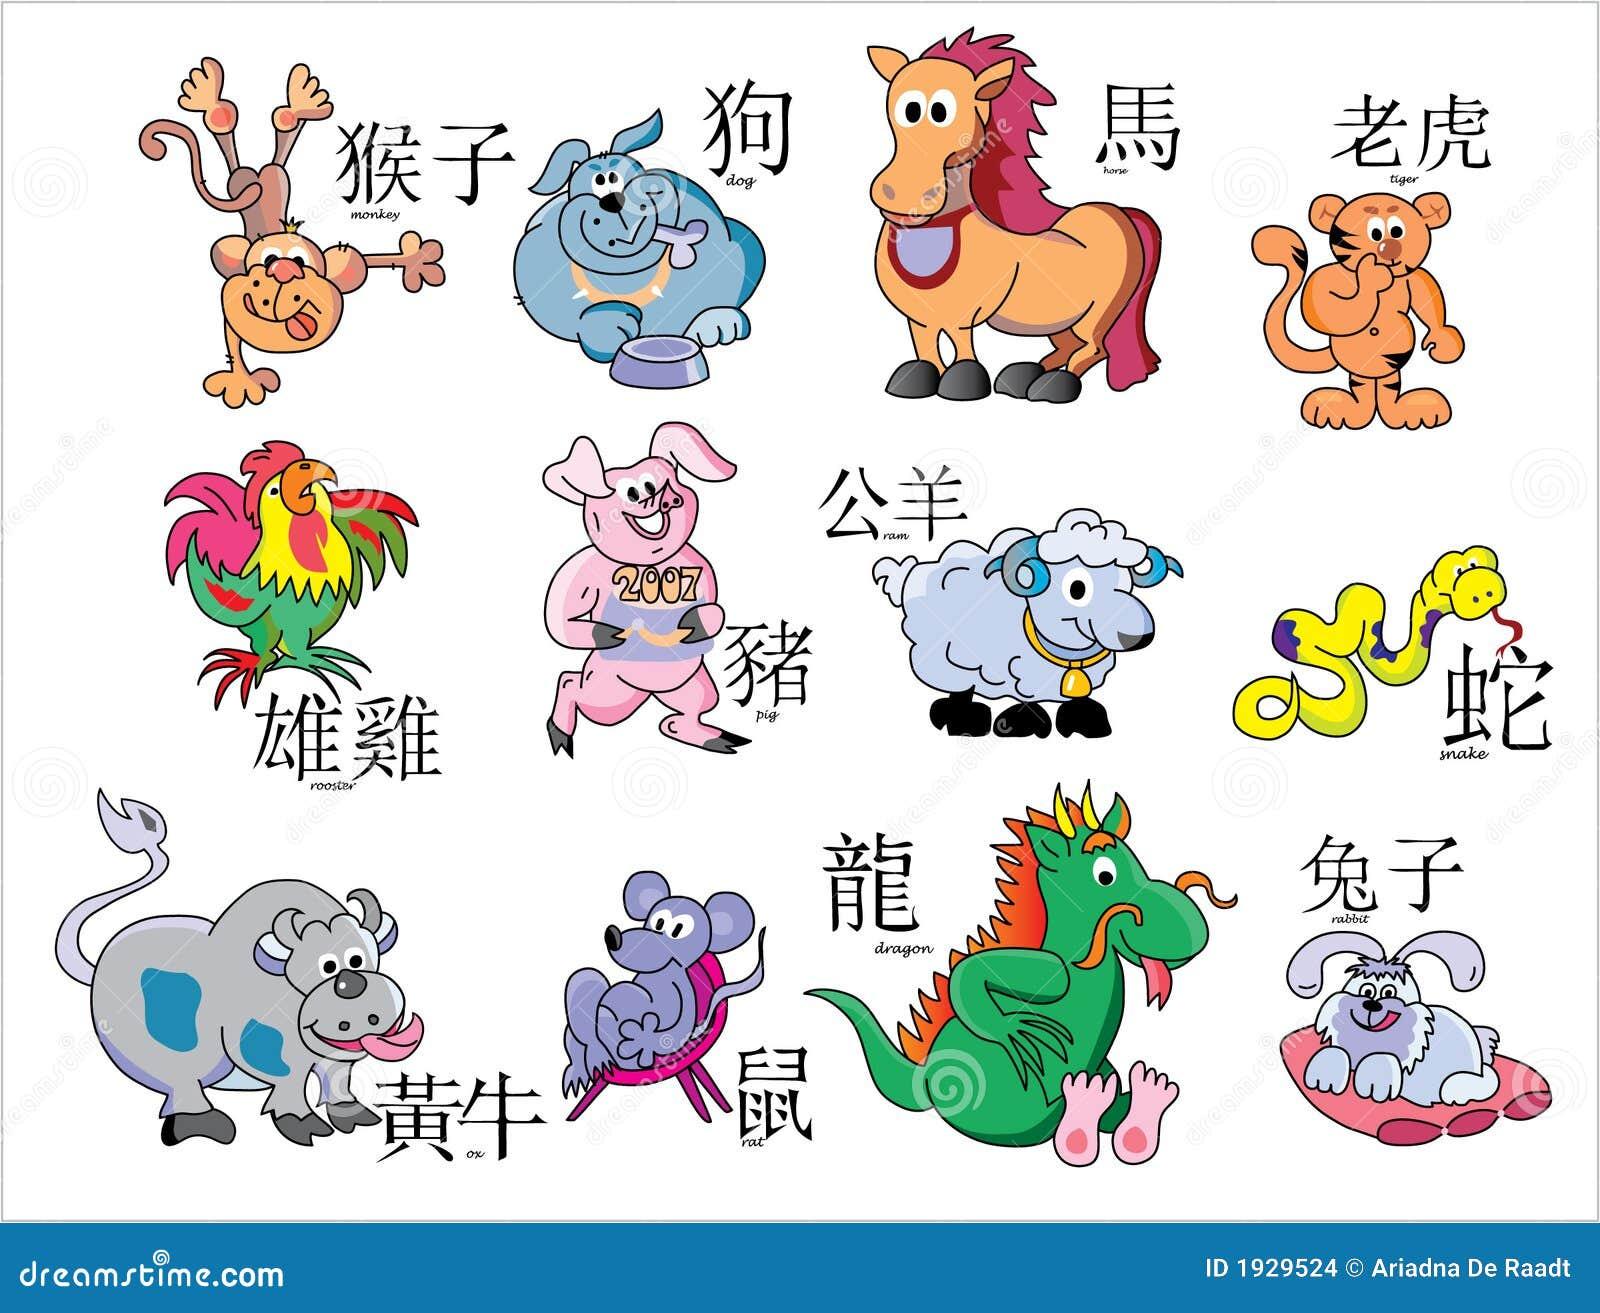 china horoskop vektor abbildung illustration von. Black Bedroom Furniture Sets. Home Design Ideas